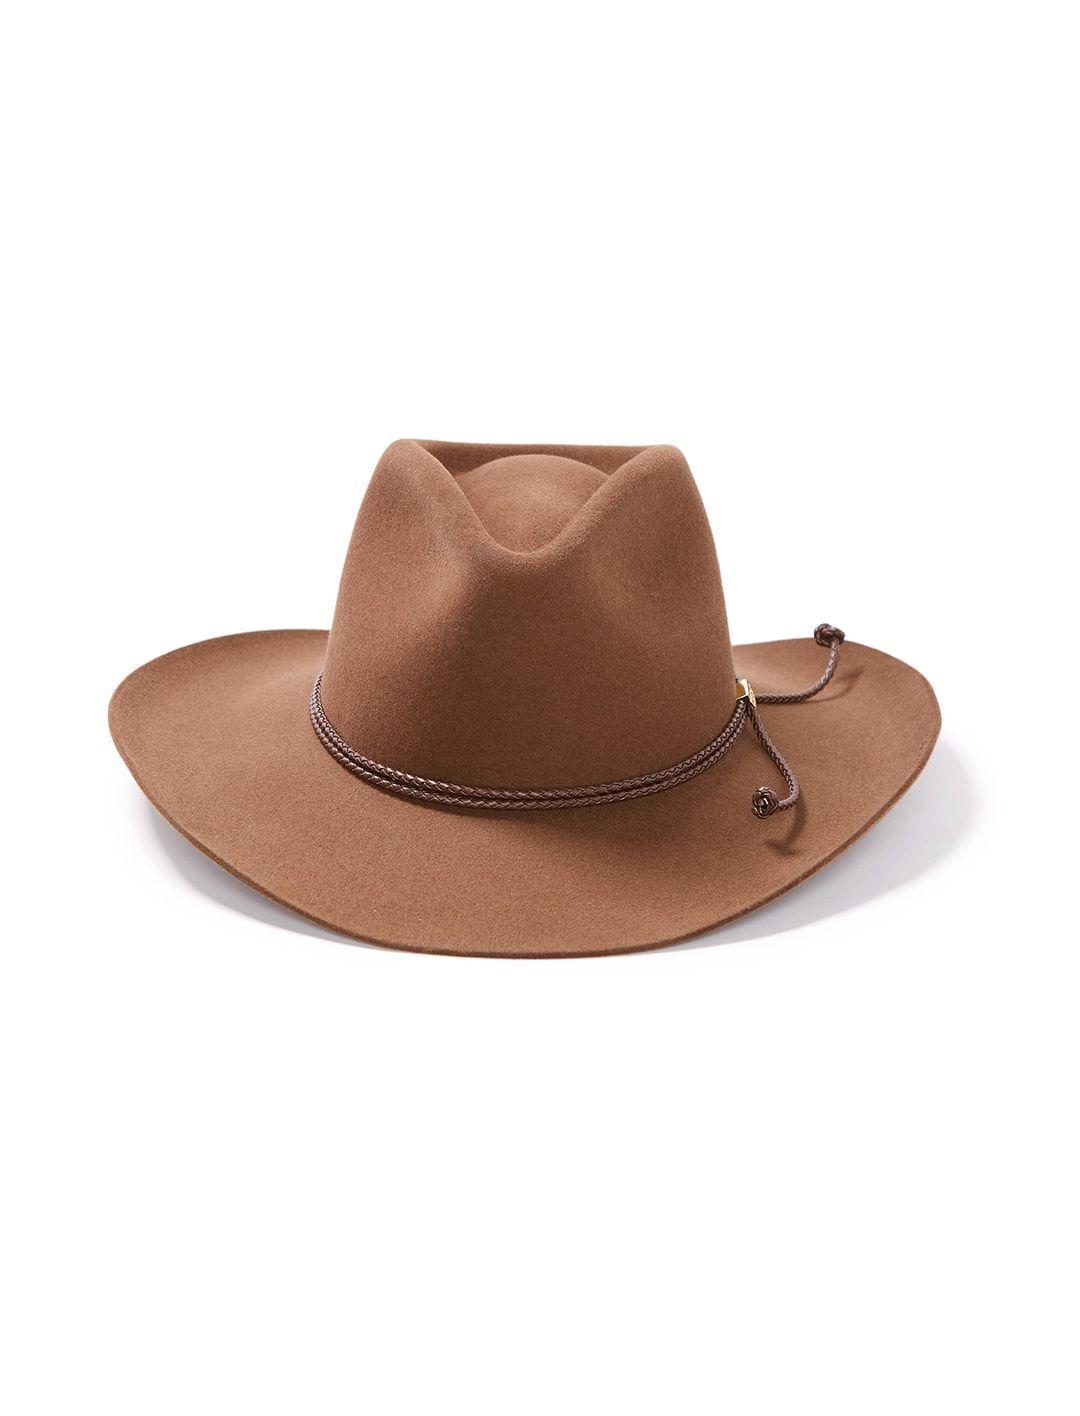 Stetson Men s CARSON 10X STRAW COWBOY HAT SSCRCMK6036. Details 3e4a973c2ecc